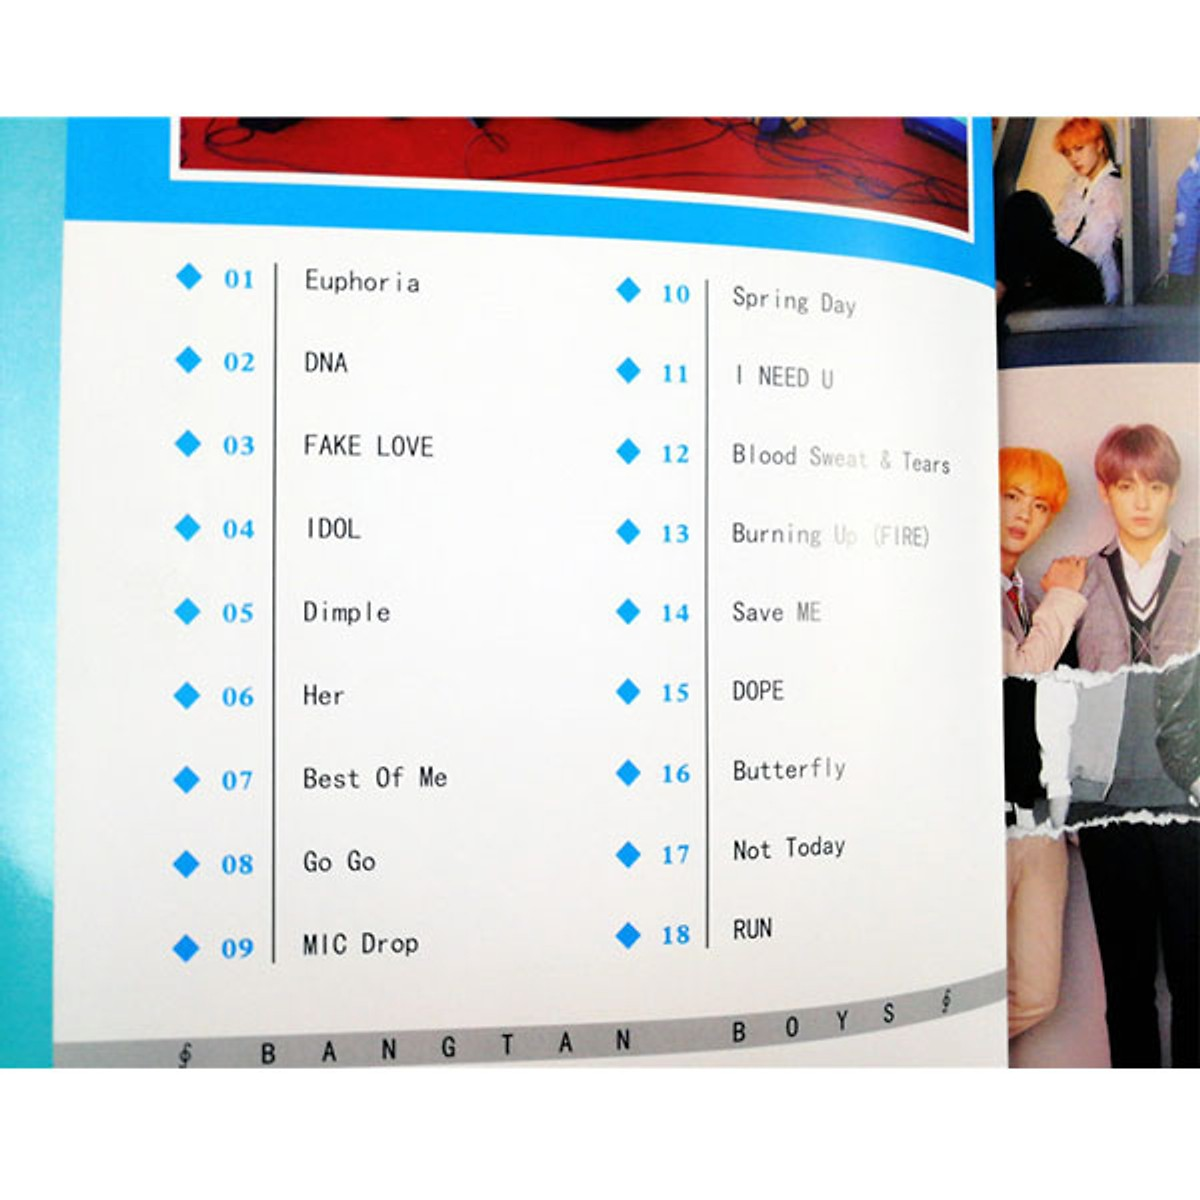 Photobook BTS lời bài hát kèm poster